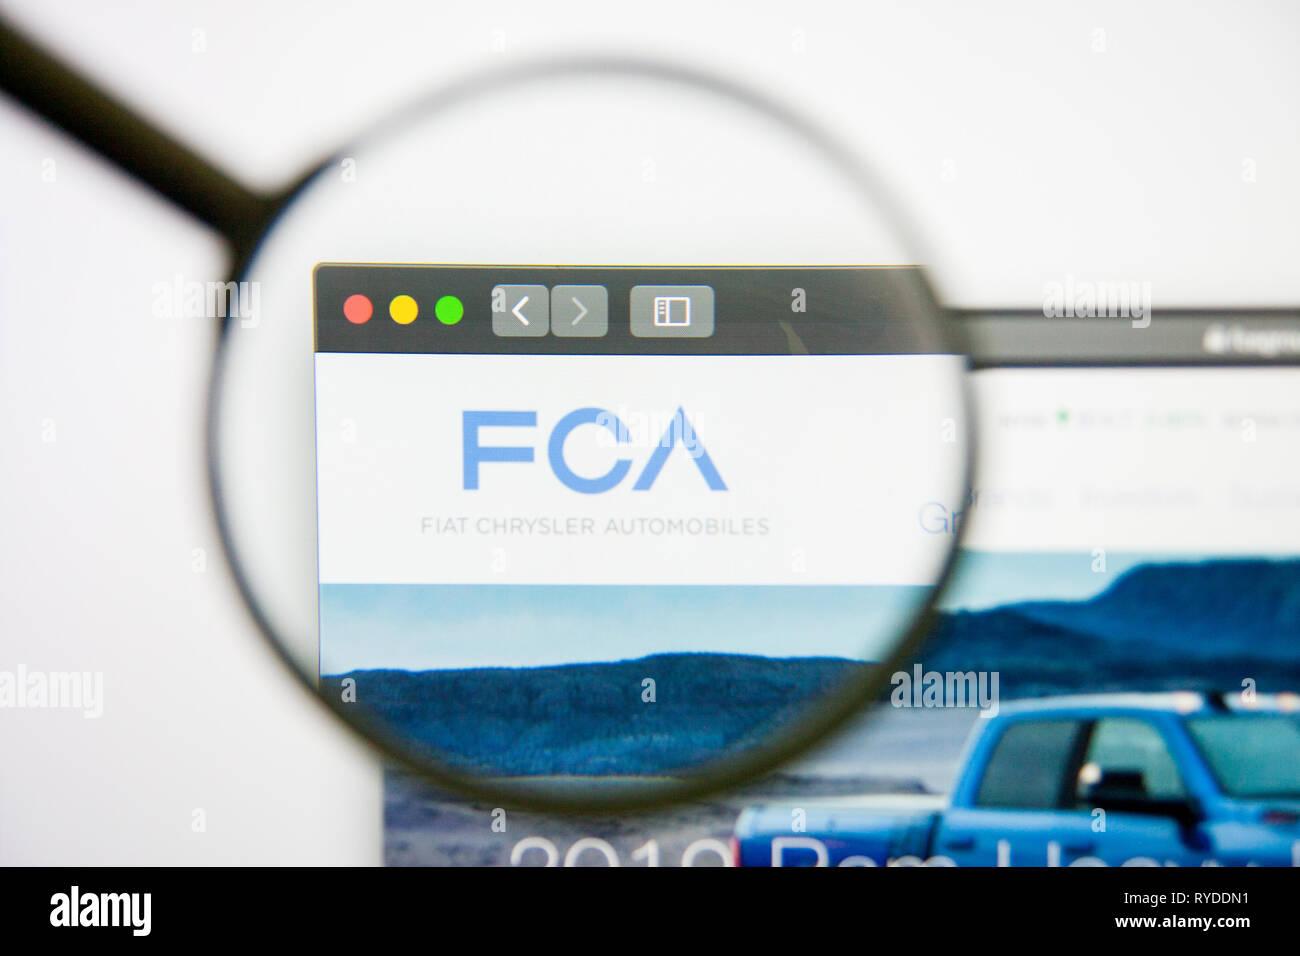 Los Angeles, California, USA - 14 February 2019: Fiat Chrysler Automobiles website homepage. Fiat Chrysler Automobiles logo visible on screen. Stock Photo